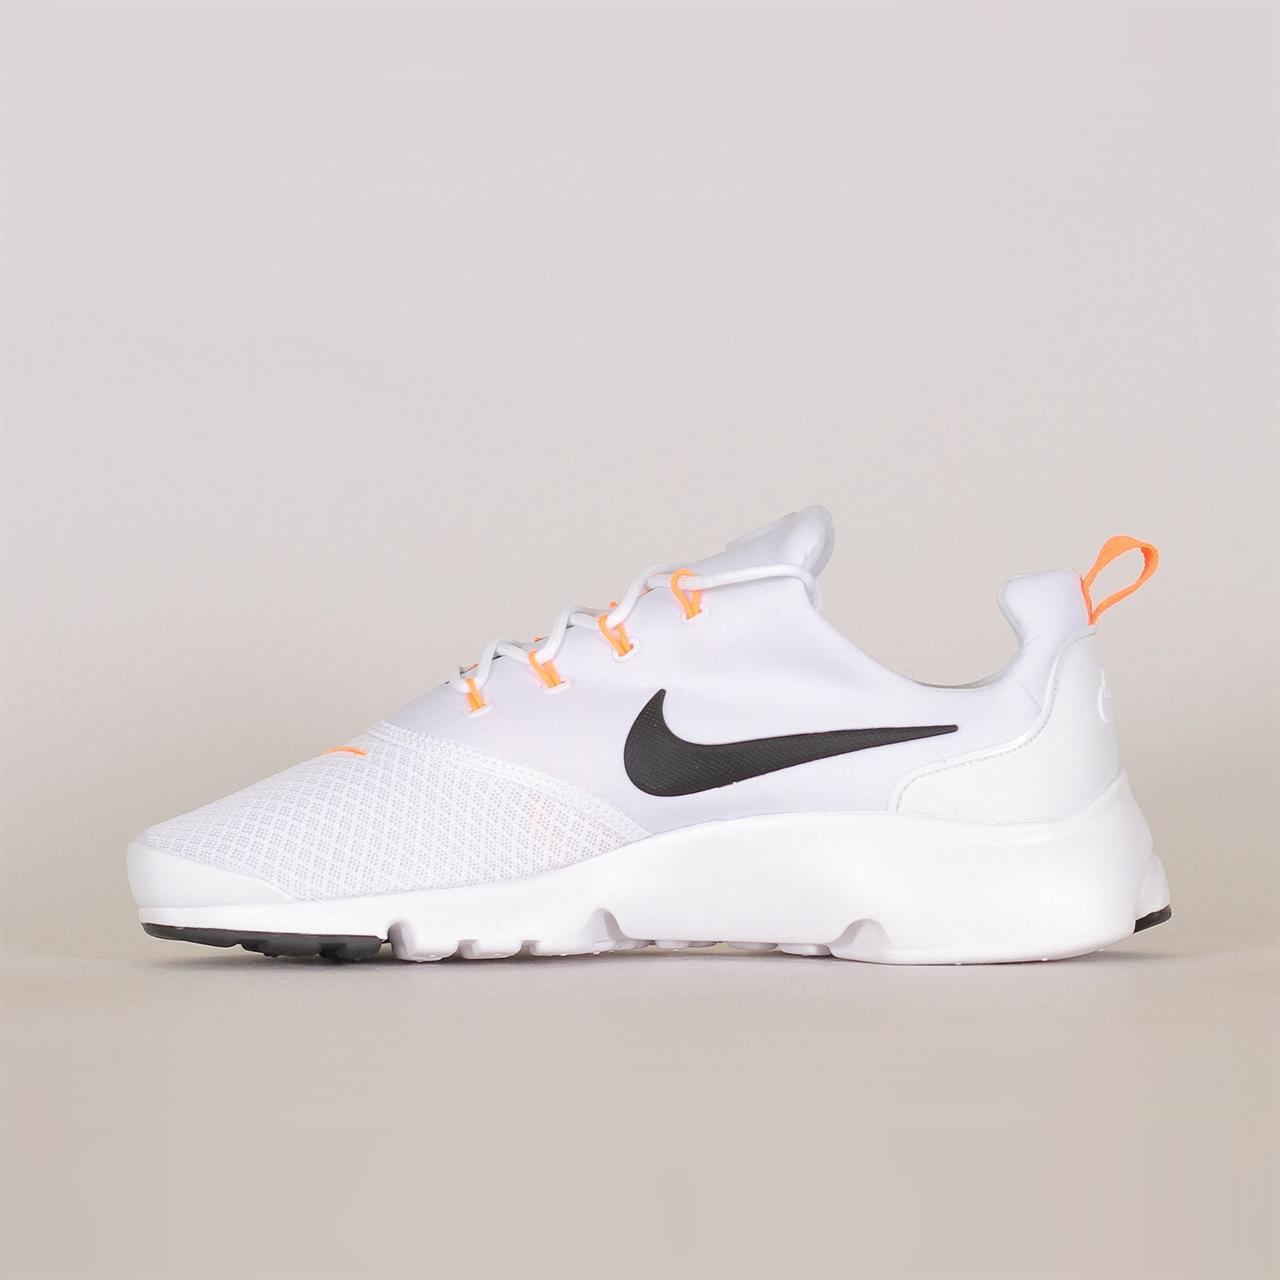 8b17a44e088 Shelta - Nike Sportswear Presto Fly Just Do It (AQ9688-100)